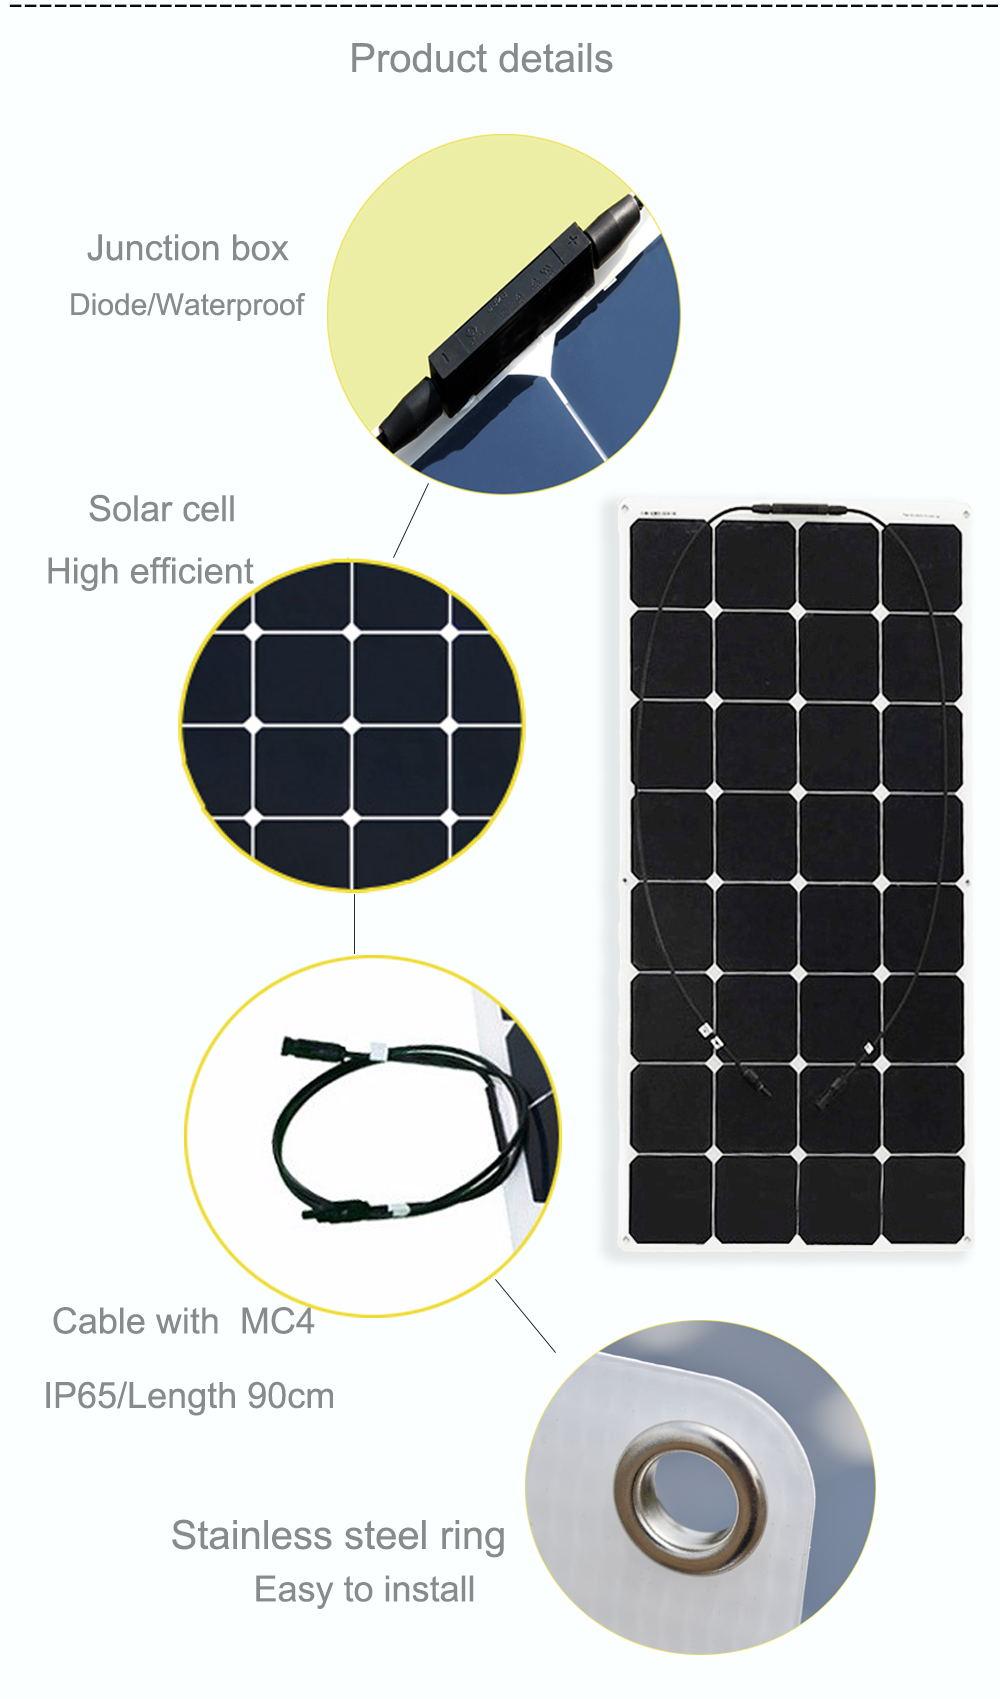 Boguang 100 Pcs 18v 100w Flexible Solar Panel 12v 24v Cell Marine Wiring Diagram 2 1